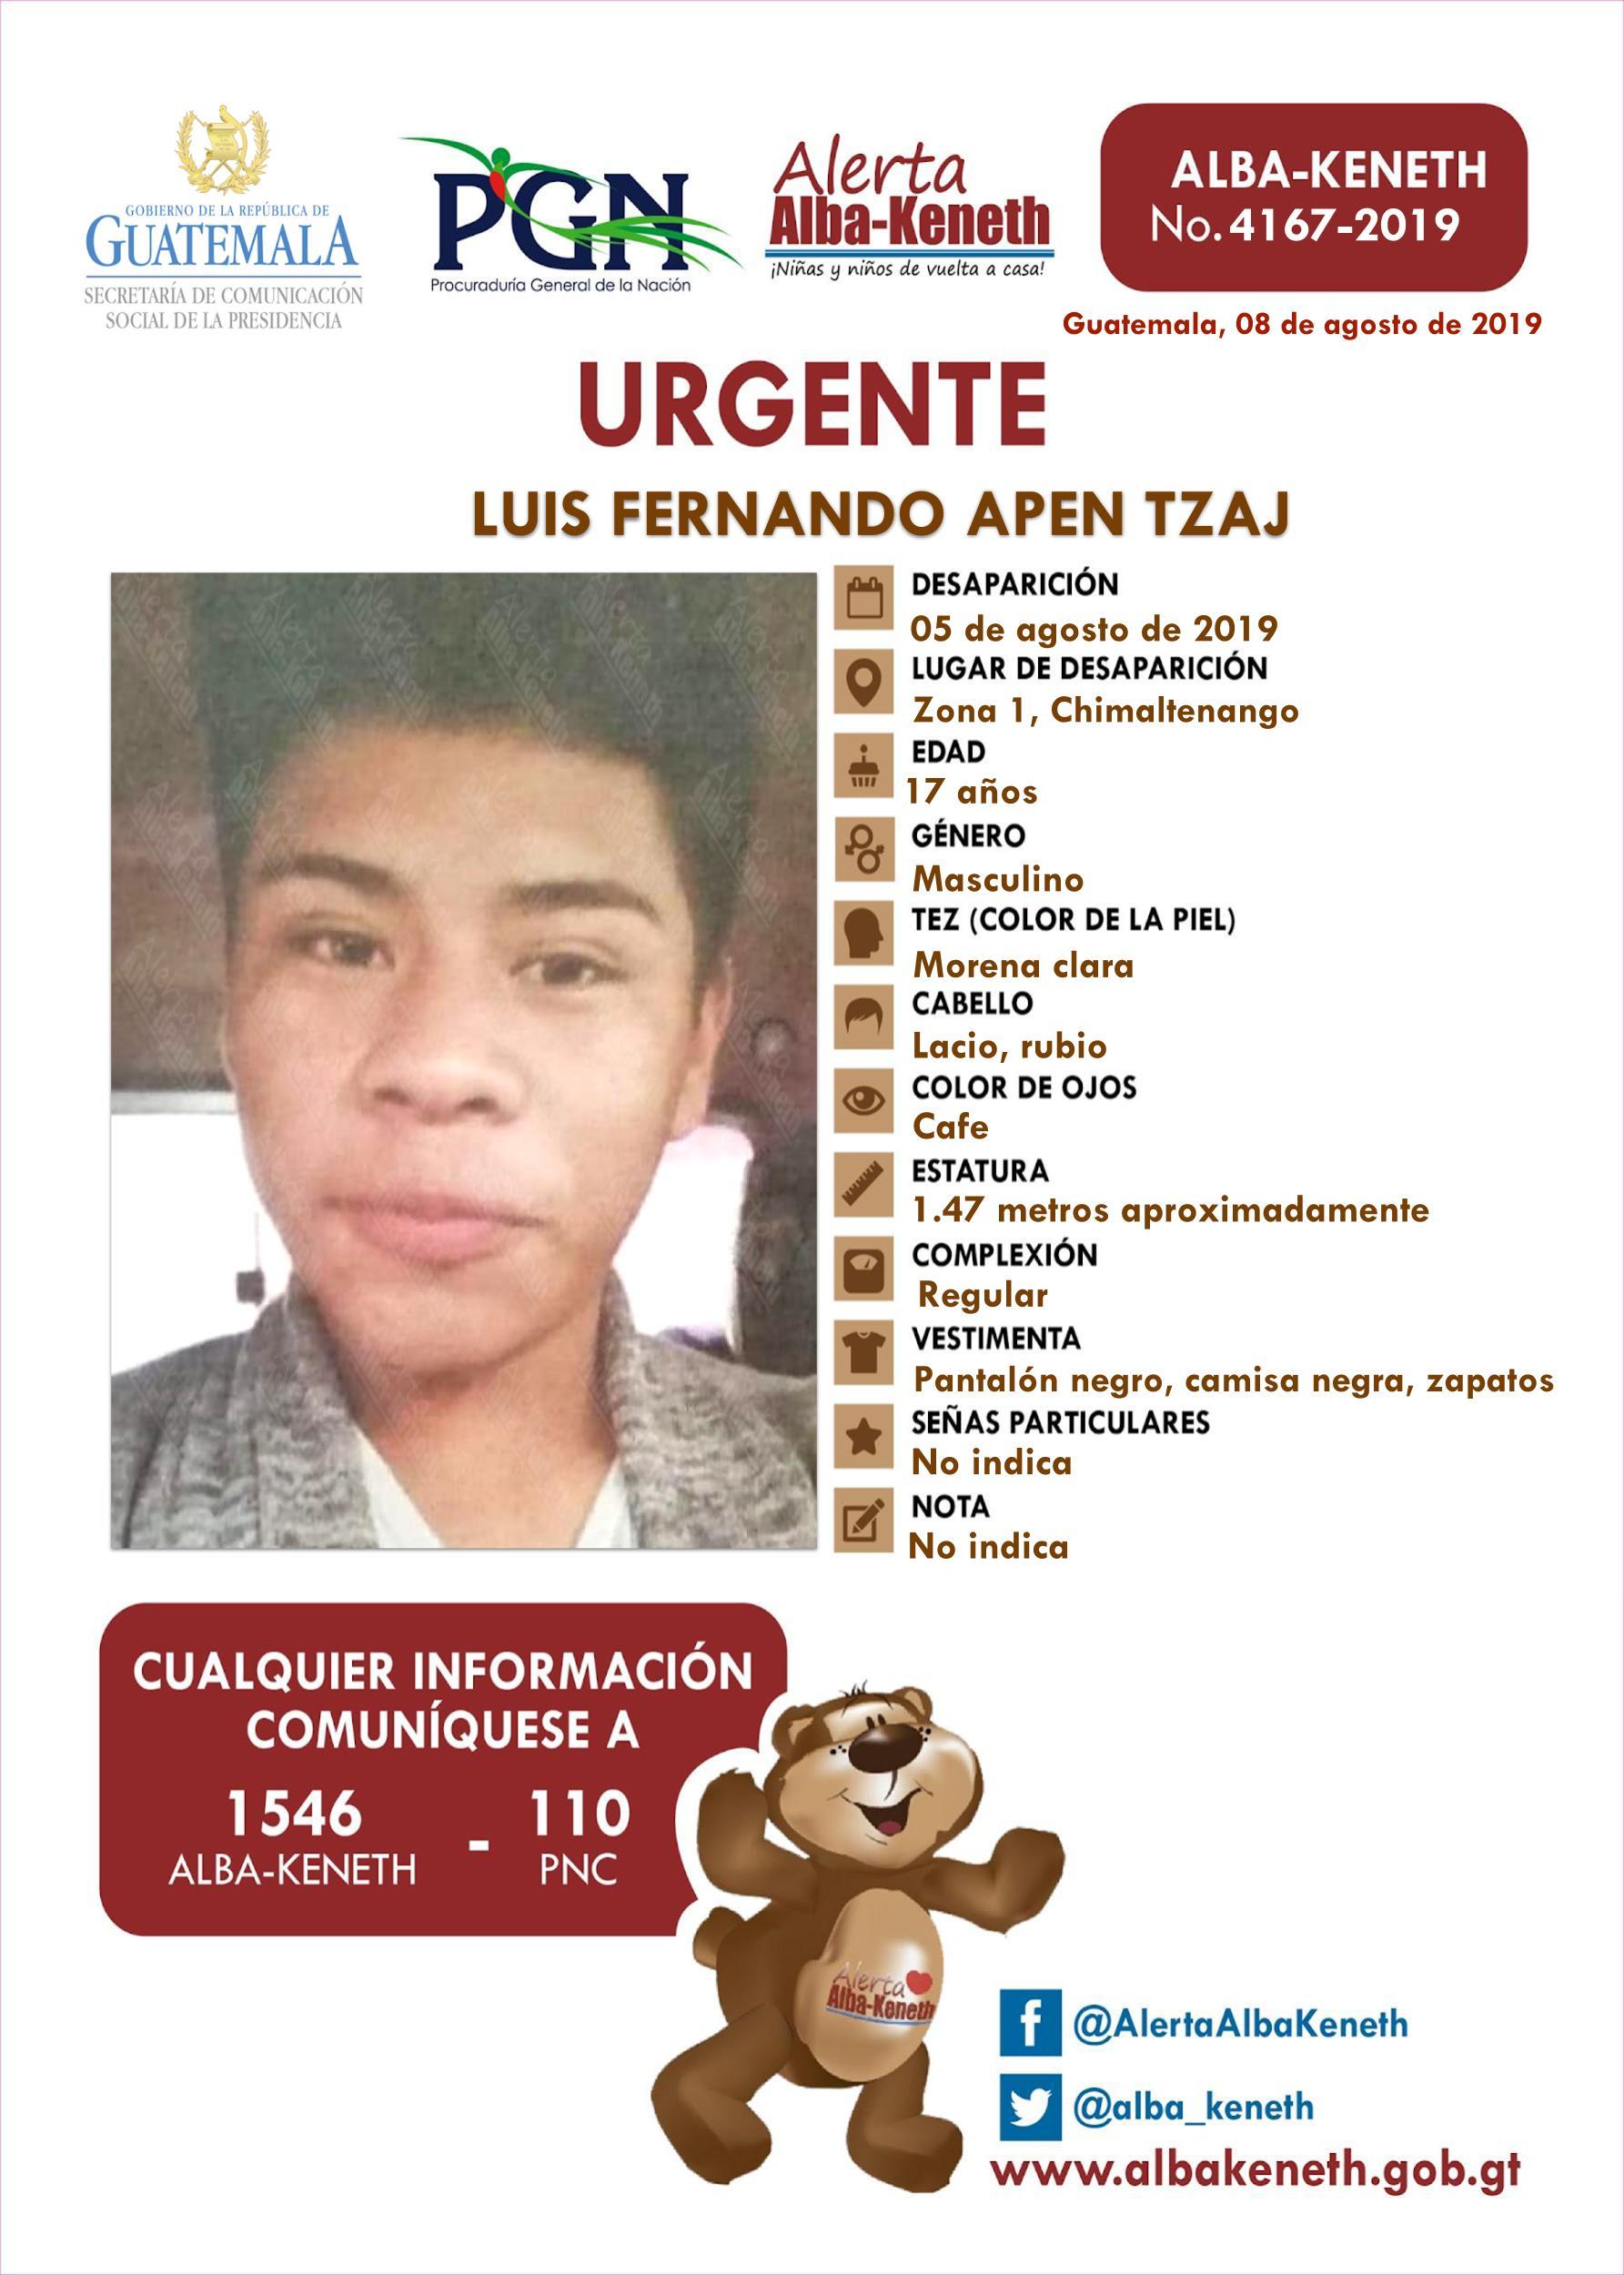 Luis Fernando Apen Tzaj